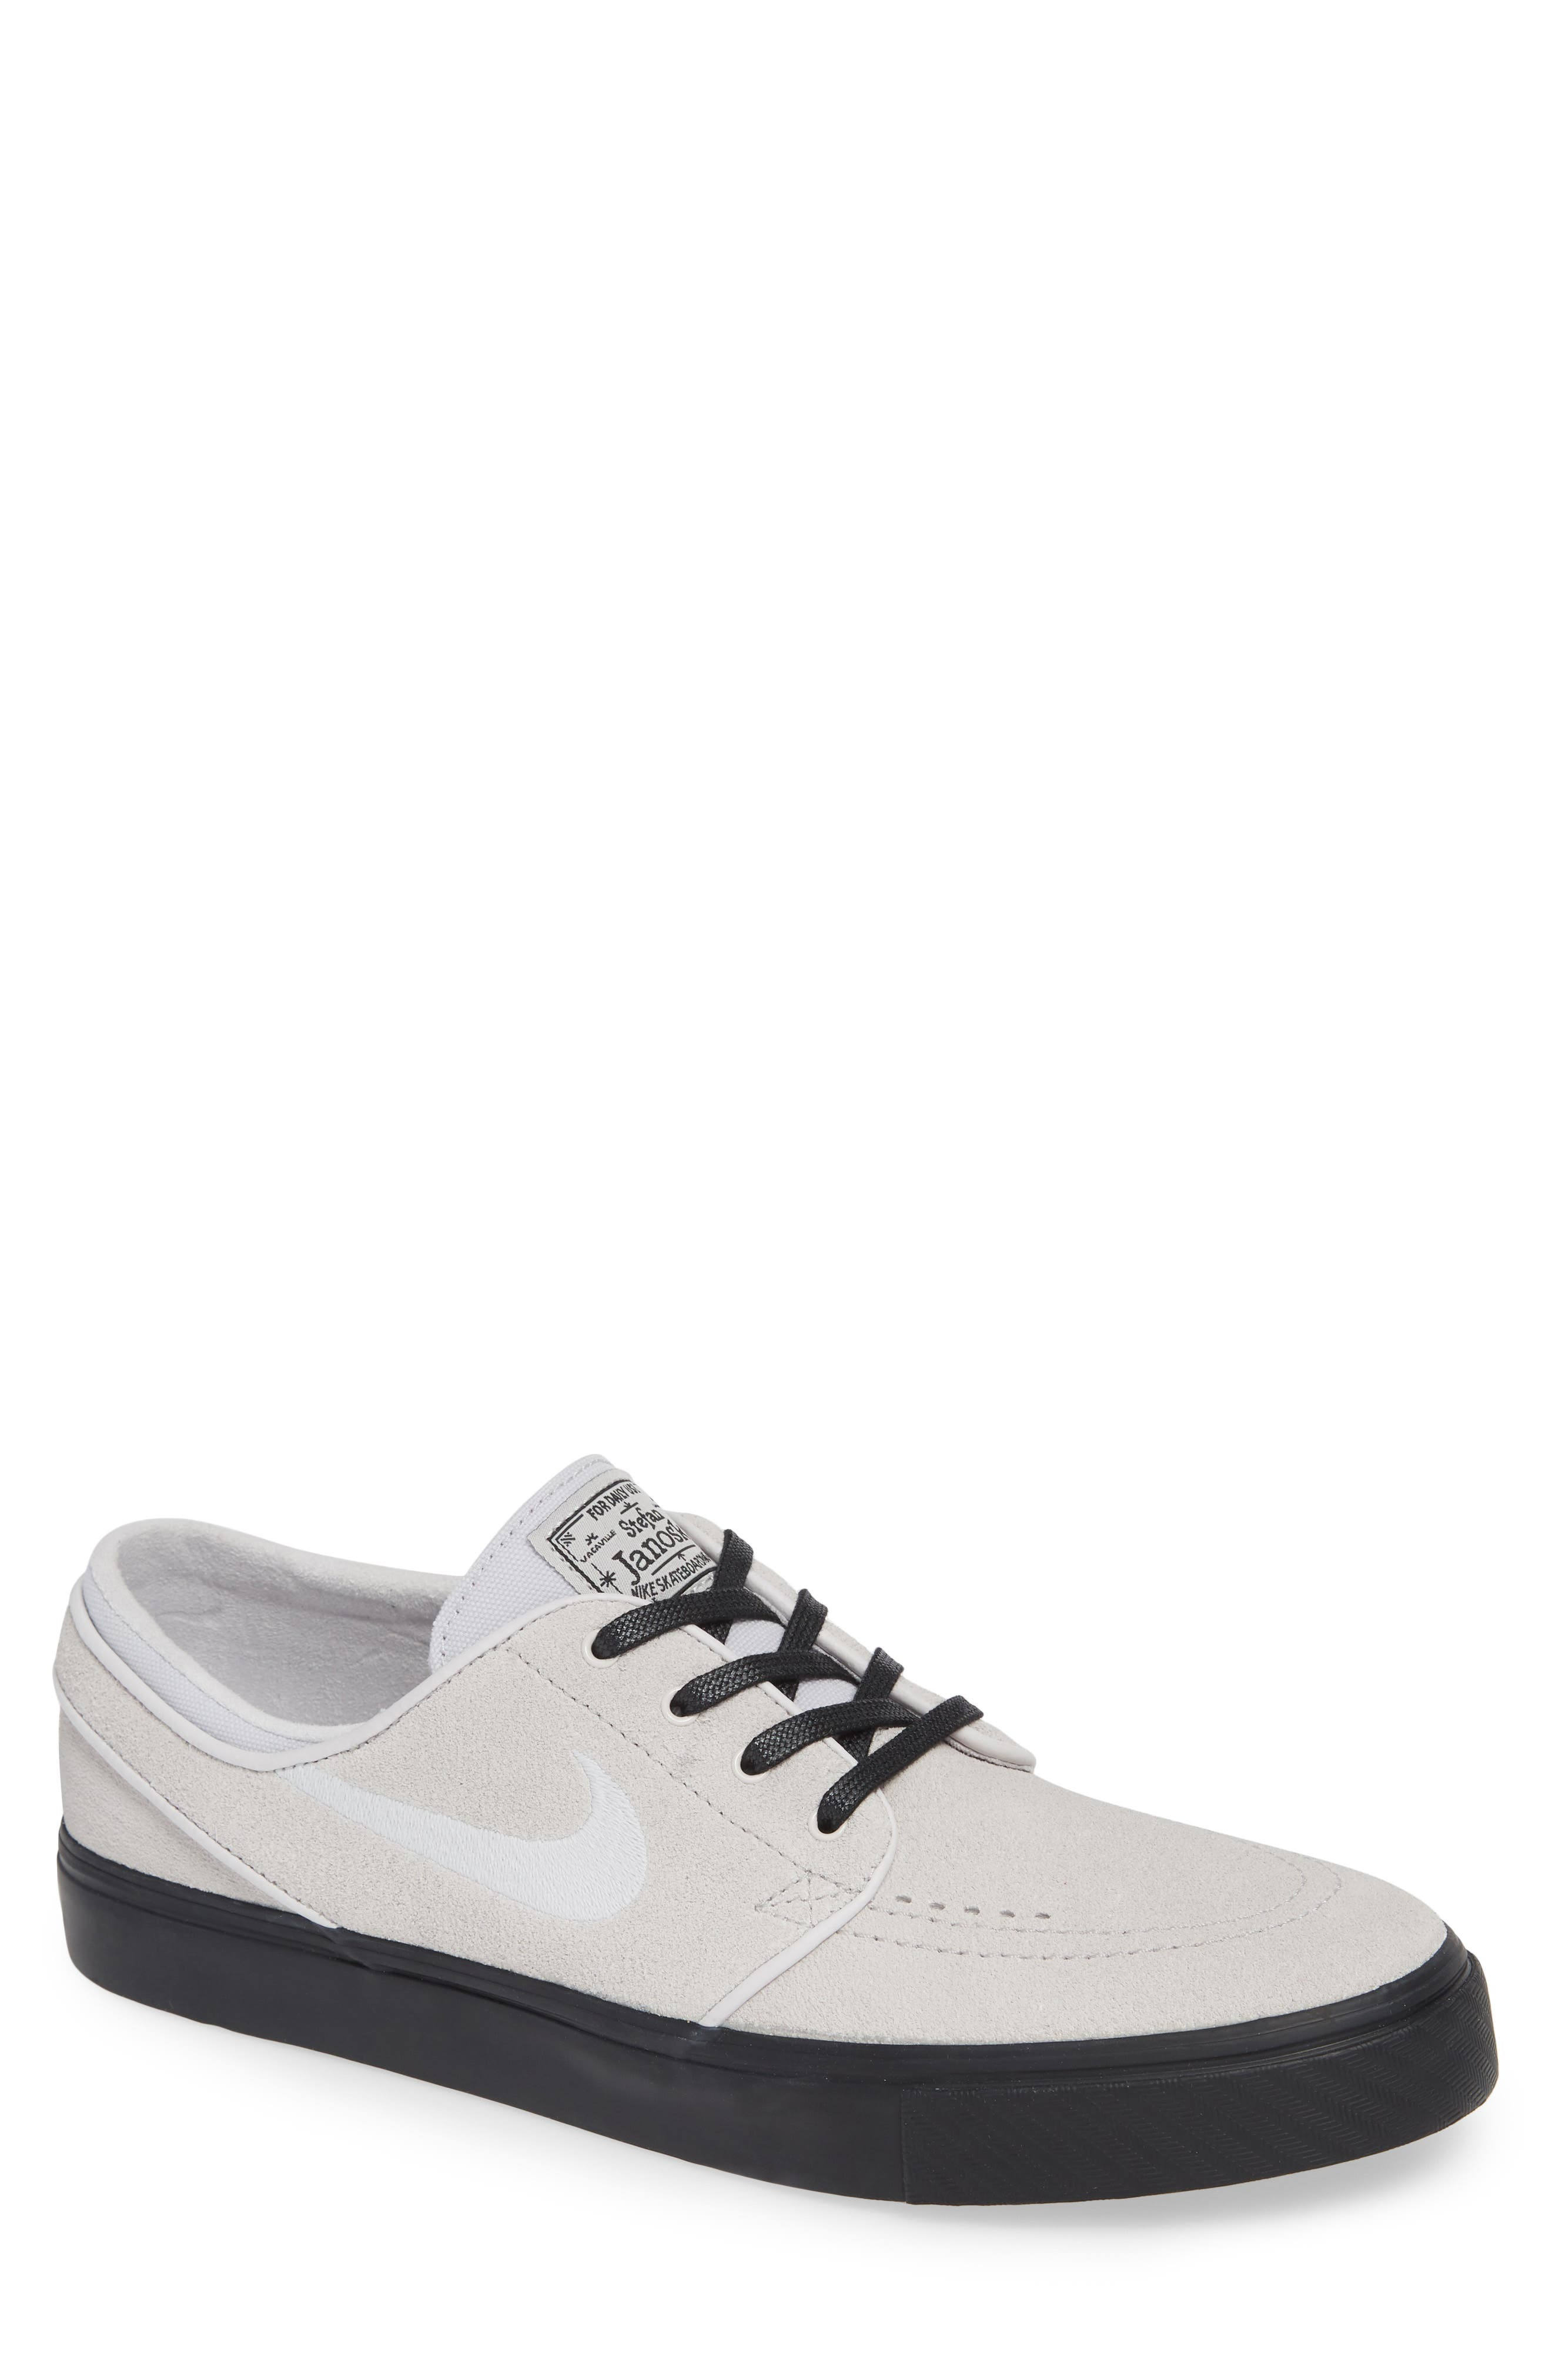 'Zoom - Stefan Janoski' Skate Shoe,                             Main thumbnail 1, color,                             068